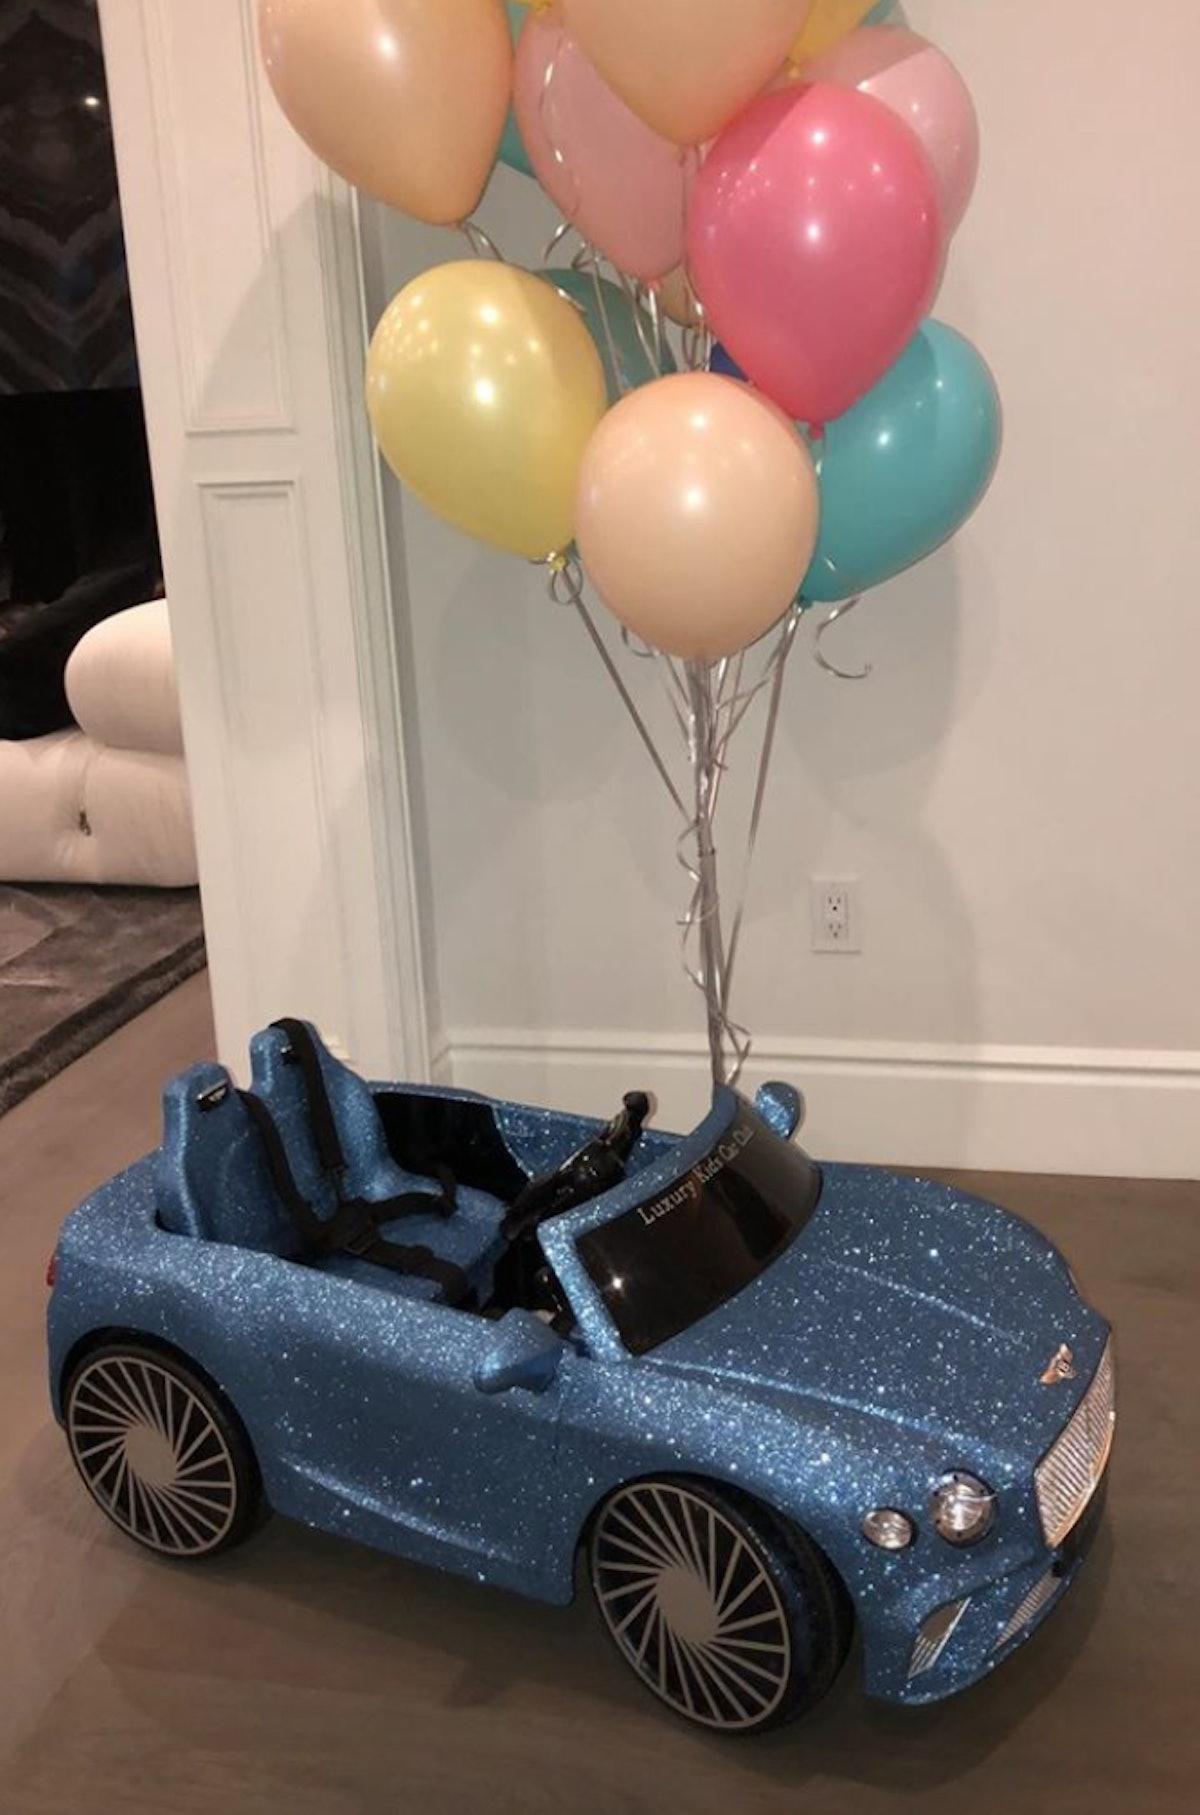 dream-kardashian-birthday-khloe-car.png